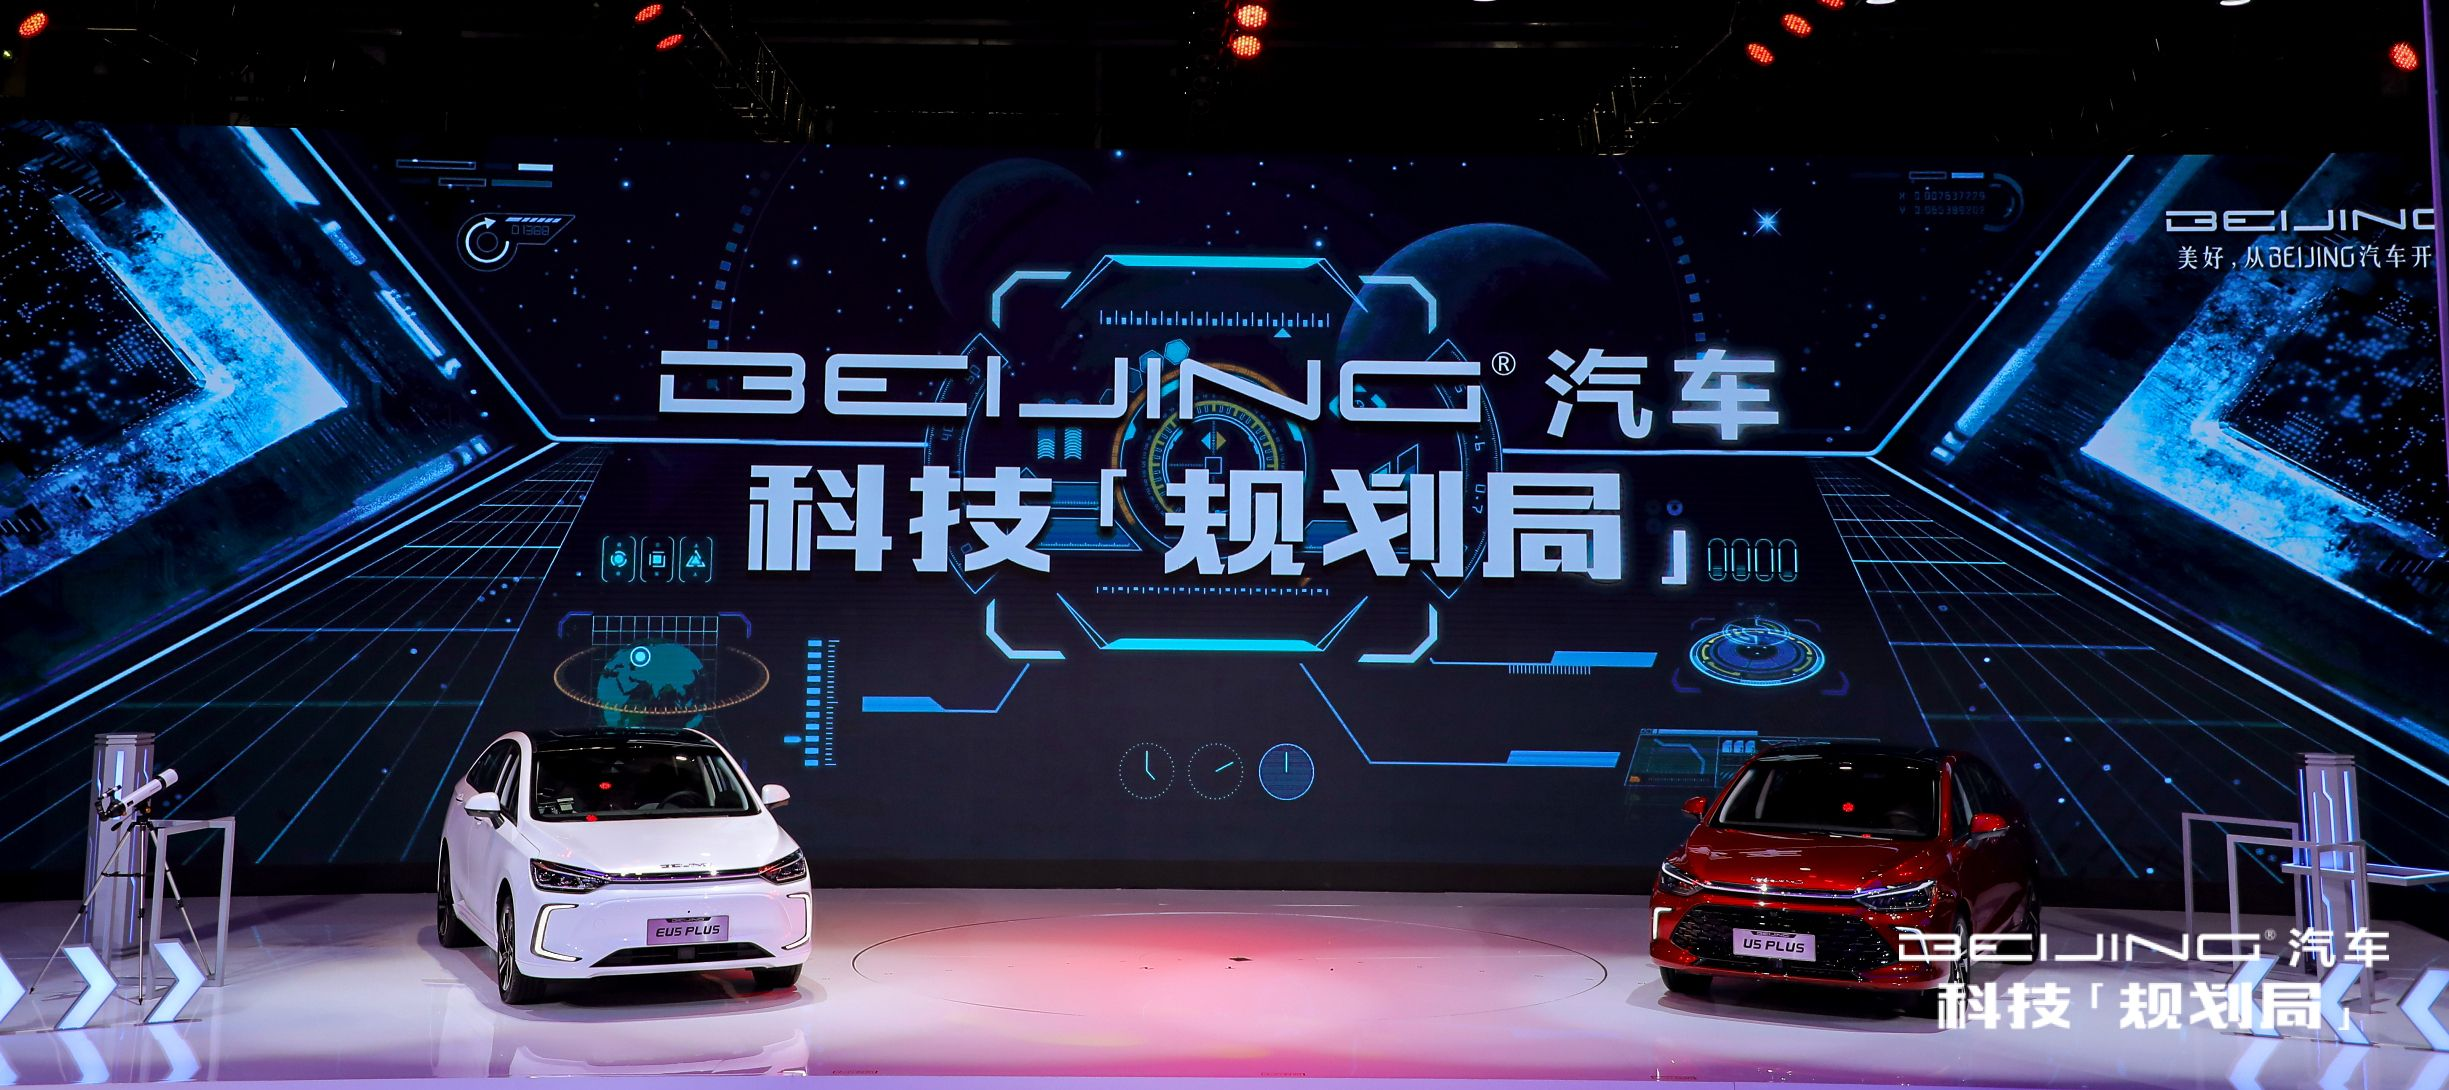 BEIJING汽车上海车展发布产品规划和两款新车-XI全网